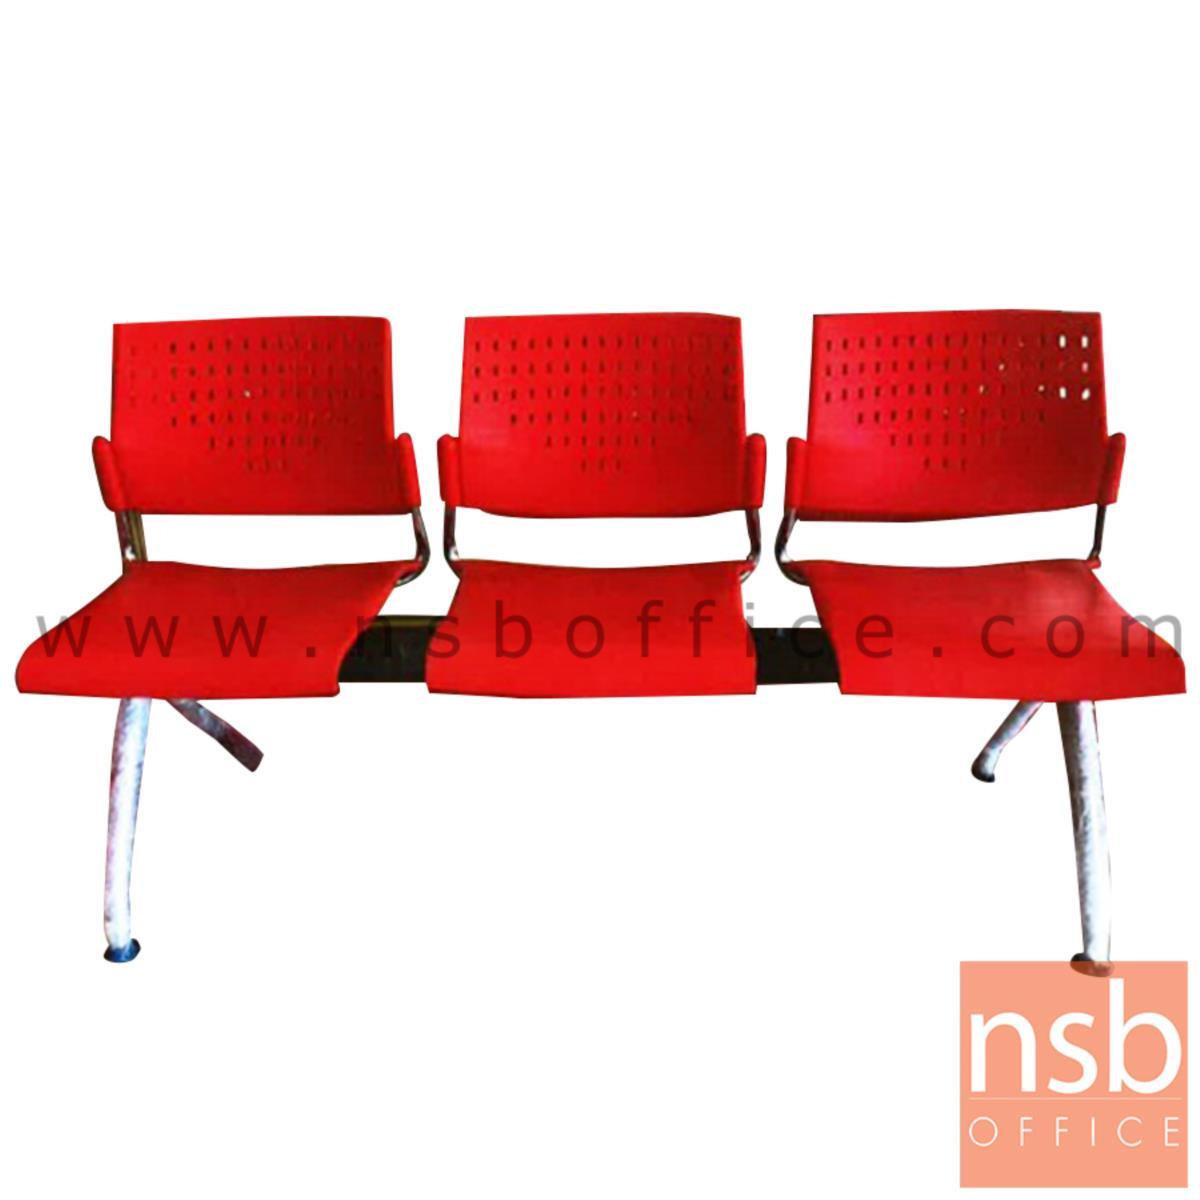 B17A040:เก้าอี้นั่งคอยเฟรมโพลี่ รุ่น 026 2 ,3 ,4 ที่นั่ง ขนาด 104W ,162W ,213W cm. ขาเหล็กชุบโครเมี่ยม